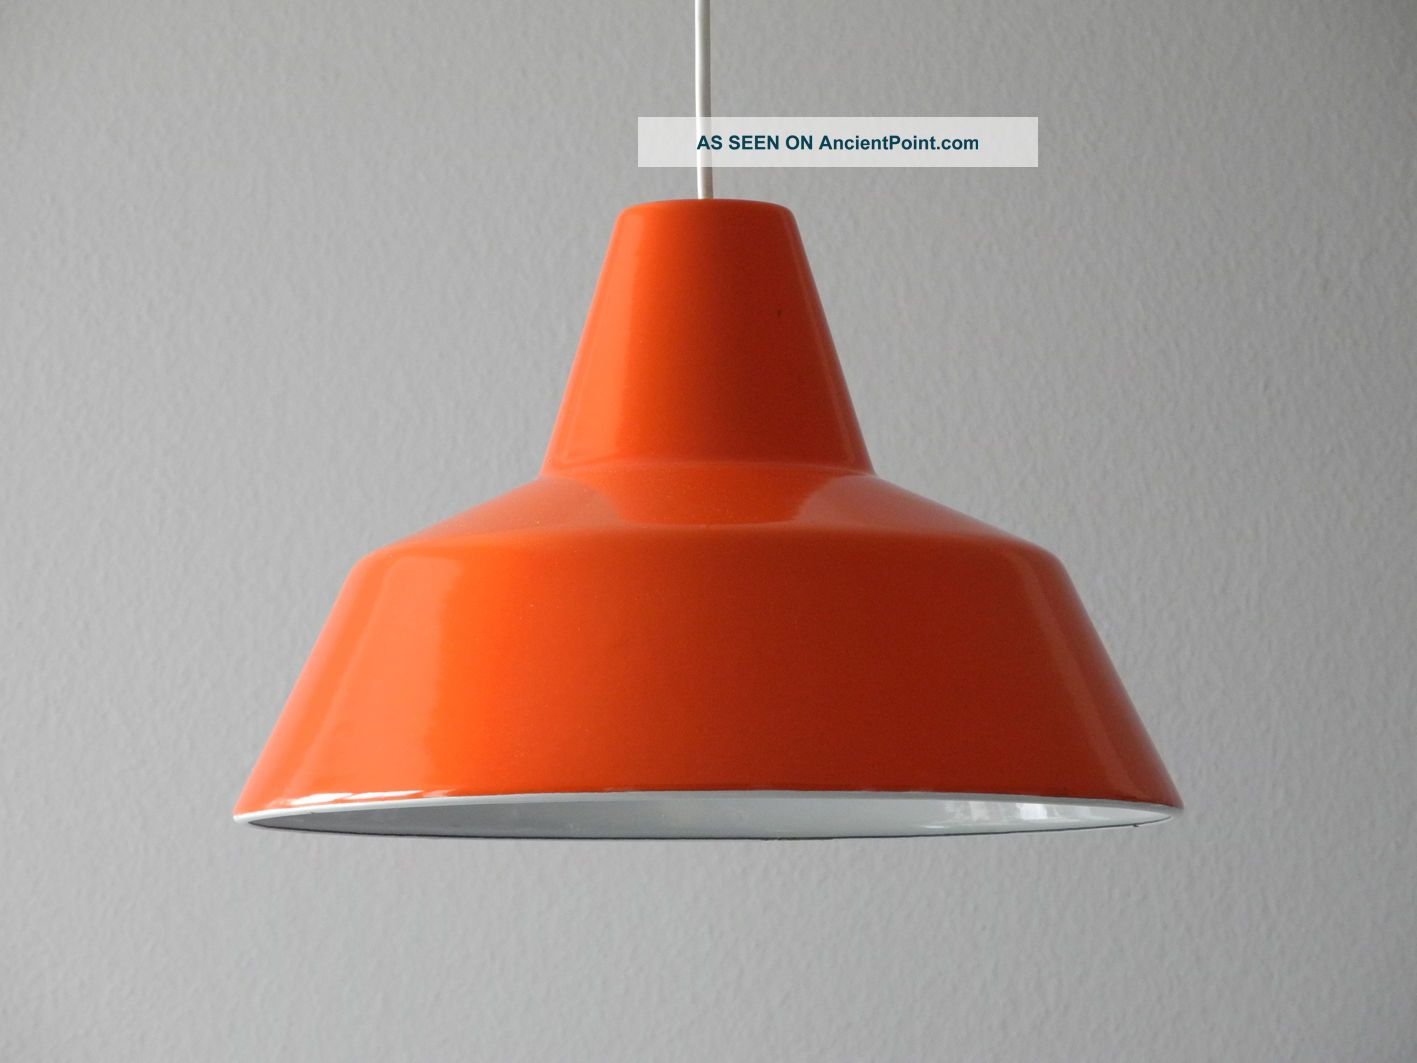 70s Louis Poulsen Enamel Factory Industrial Ceiling Lamp In Orange & White Mid-Century Modernism photo